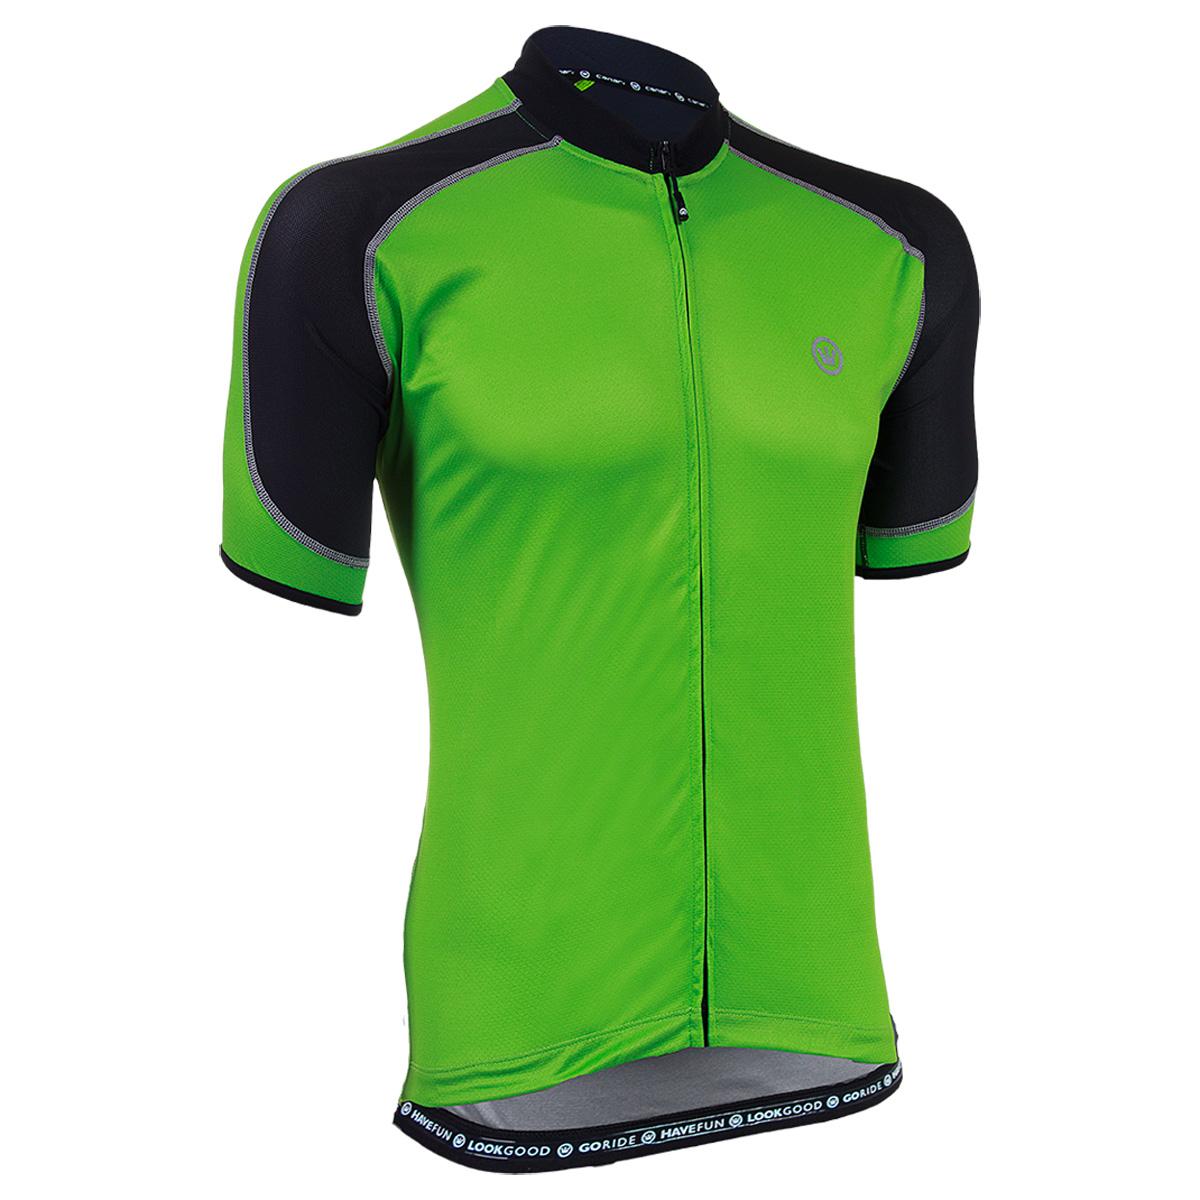 Canari Cyclewear 2016 Men's Streamline Short Sleeve Cycling Jersey - 12253